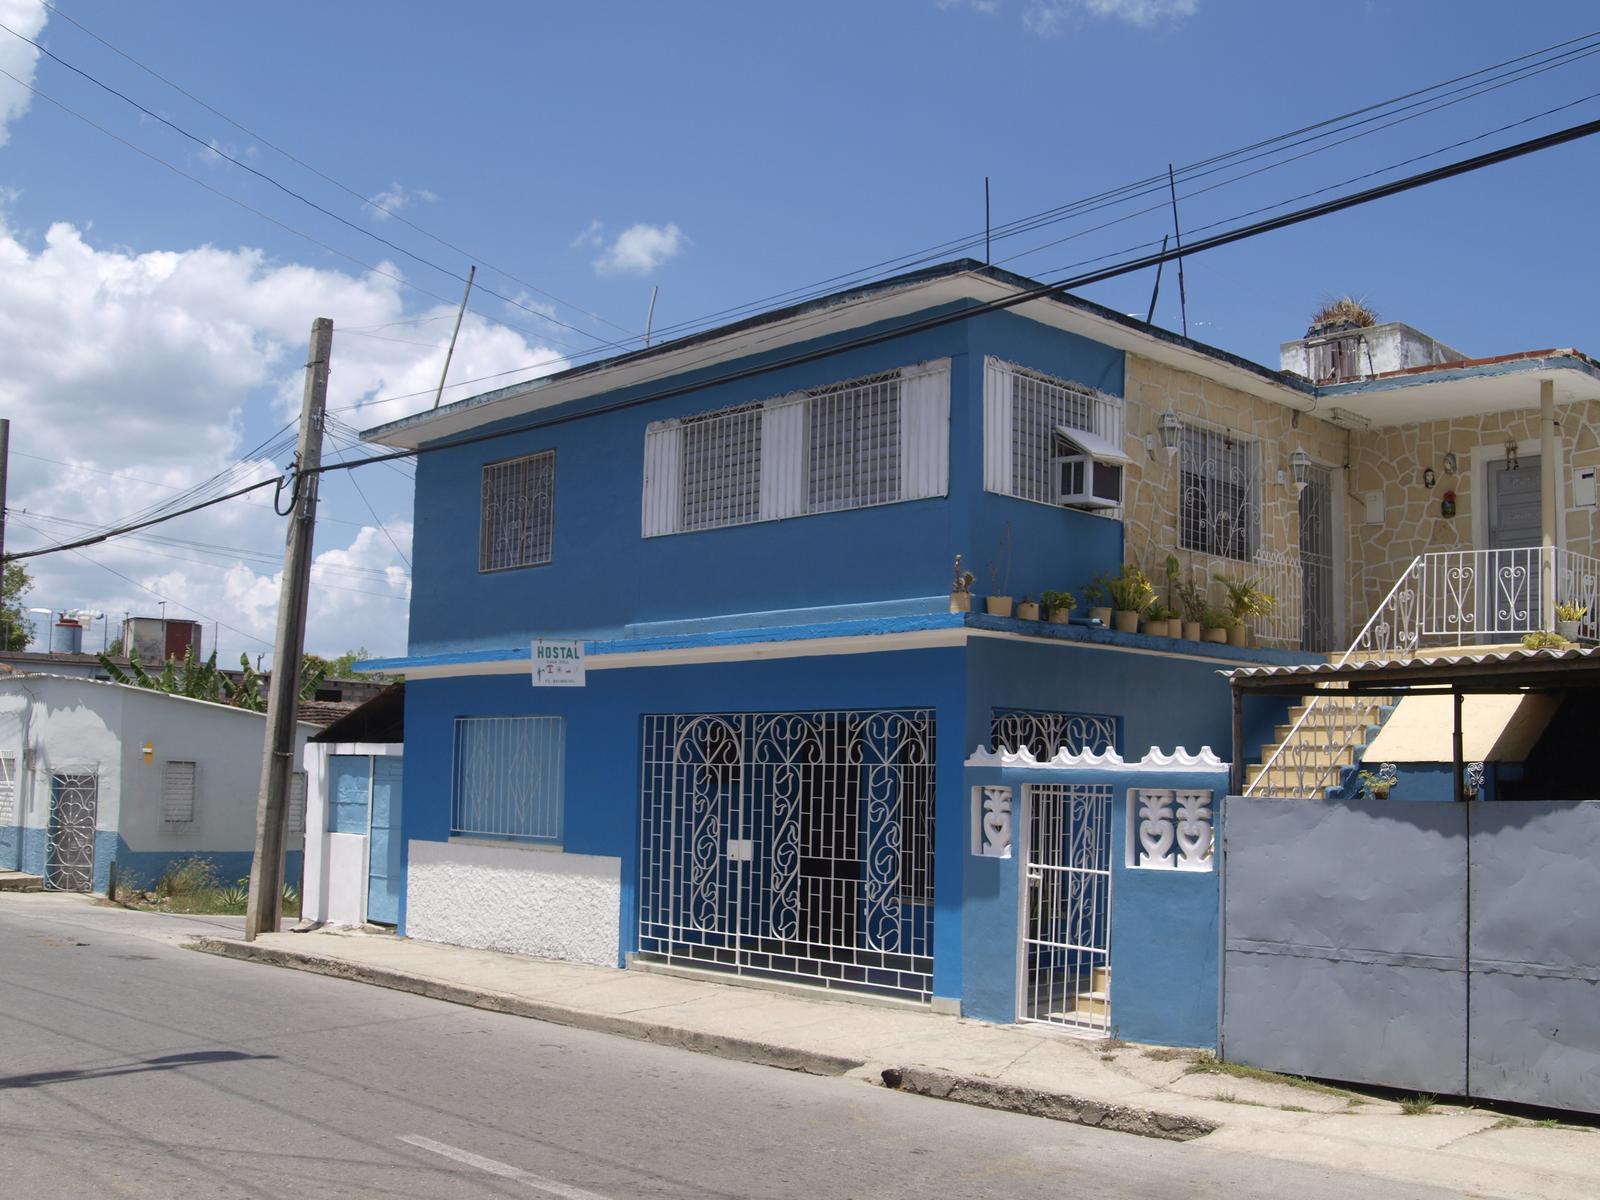 Kuba architektúra - Obrázok č. 6